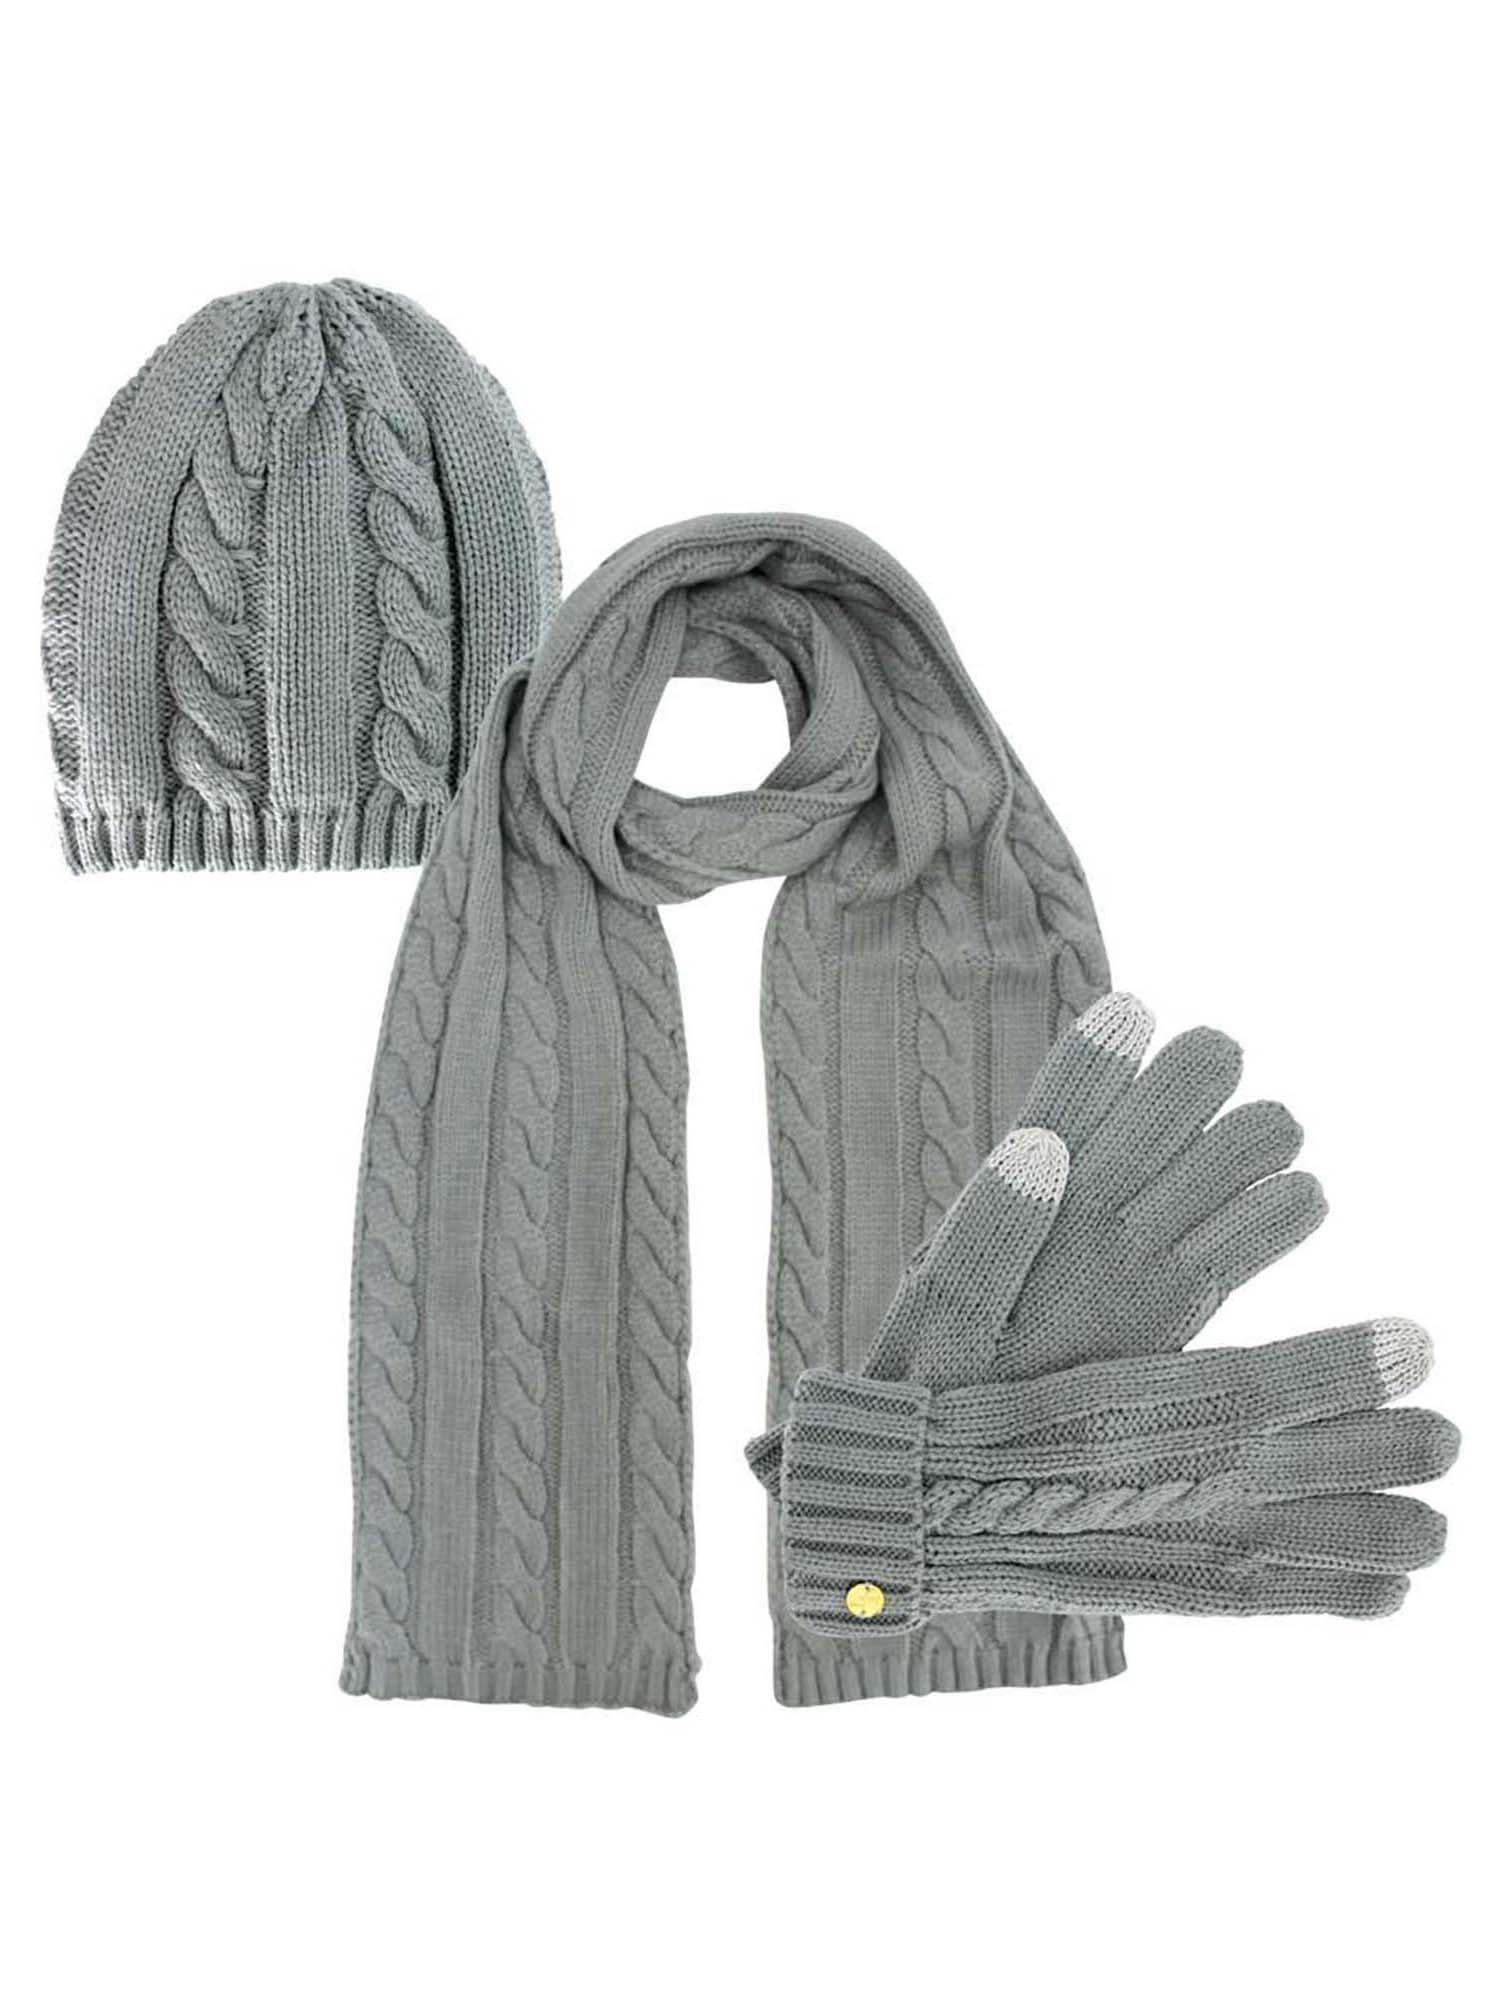 Light Grey 3 Piece Beanie Hat Texting Gloves & Matching Scarf Set